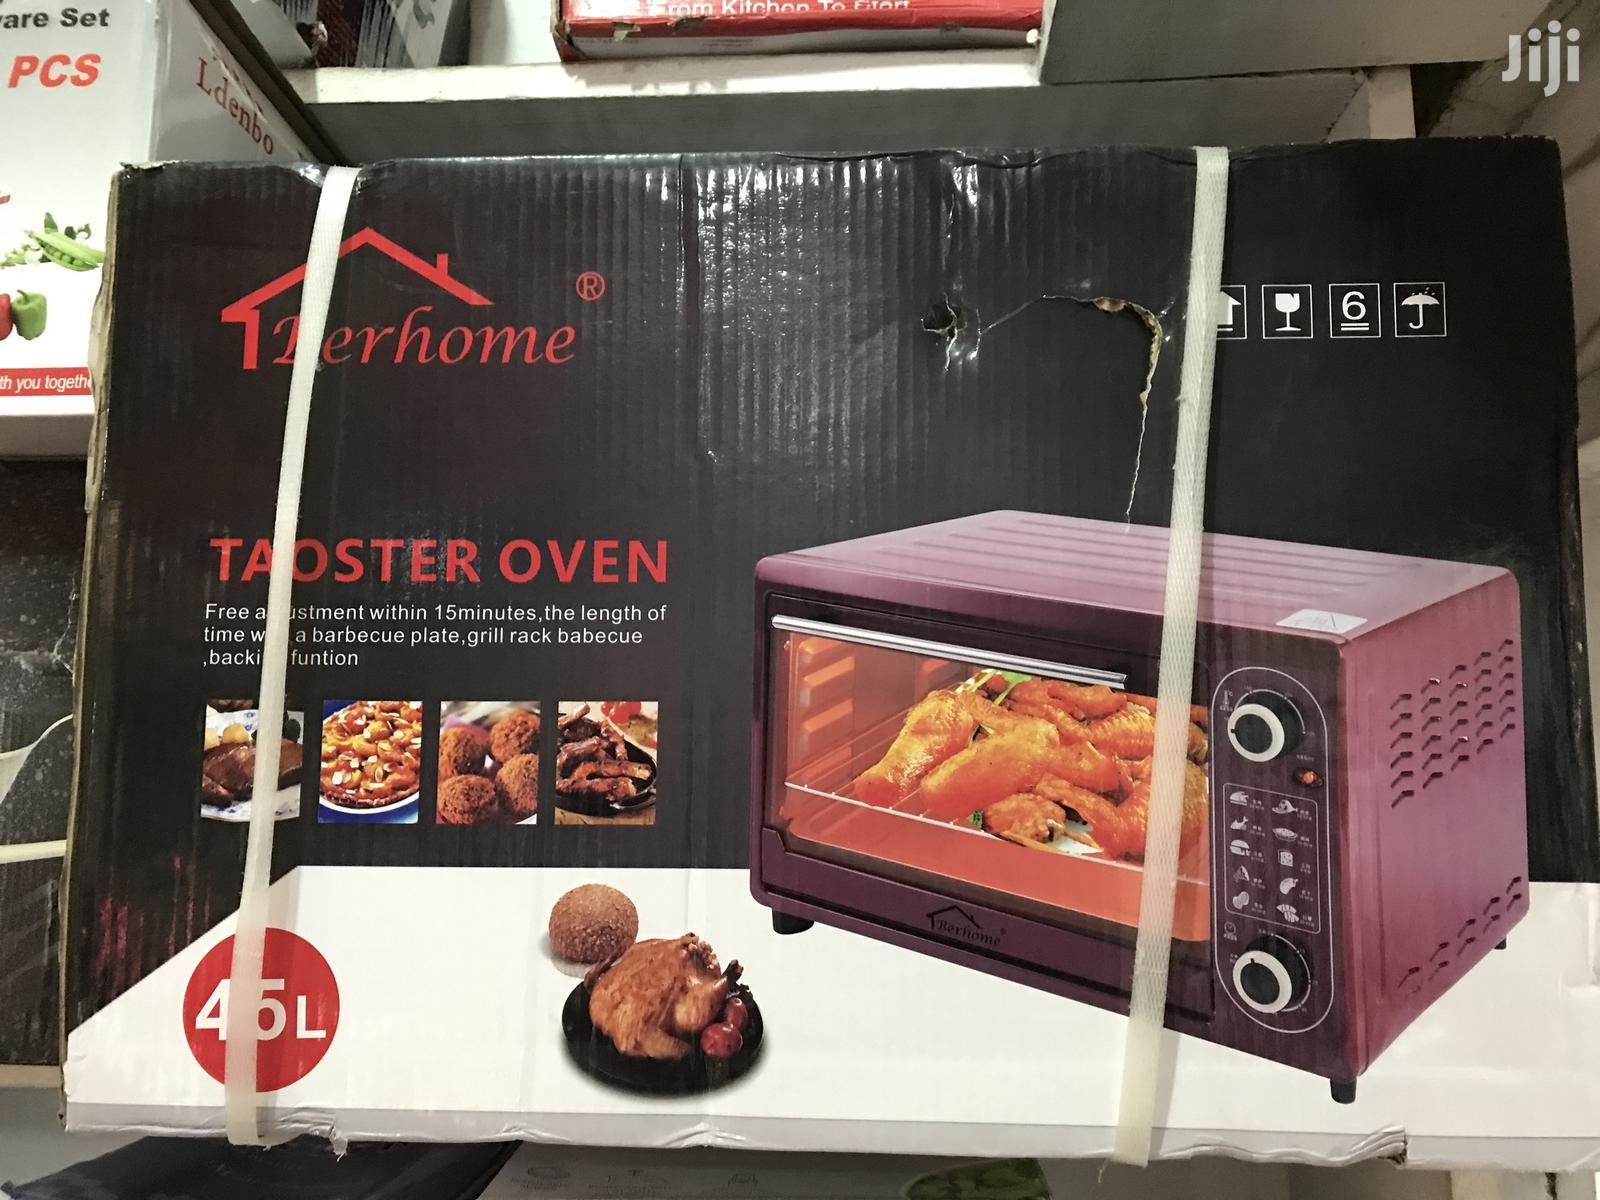 Berhome Toaster Oven